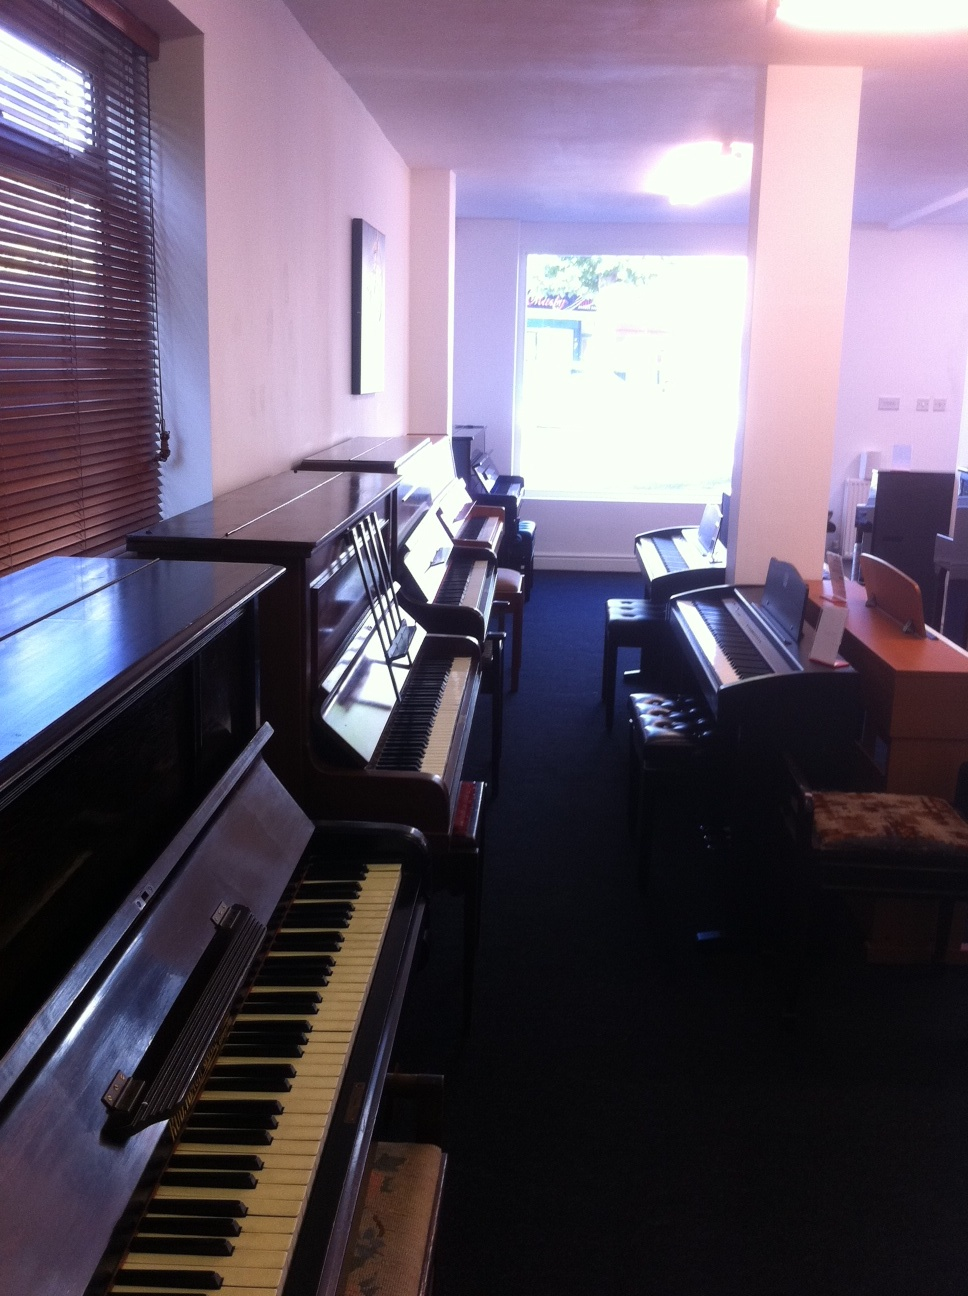 uk pianos shop in enfield north london uk. Black Bedroom Furniture Sets. Home Design Ideas